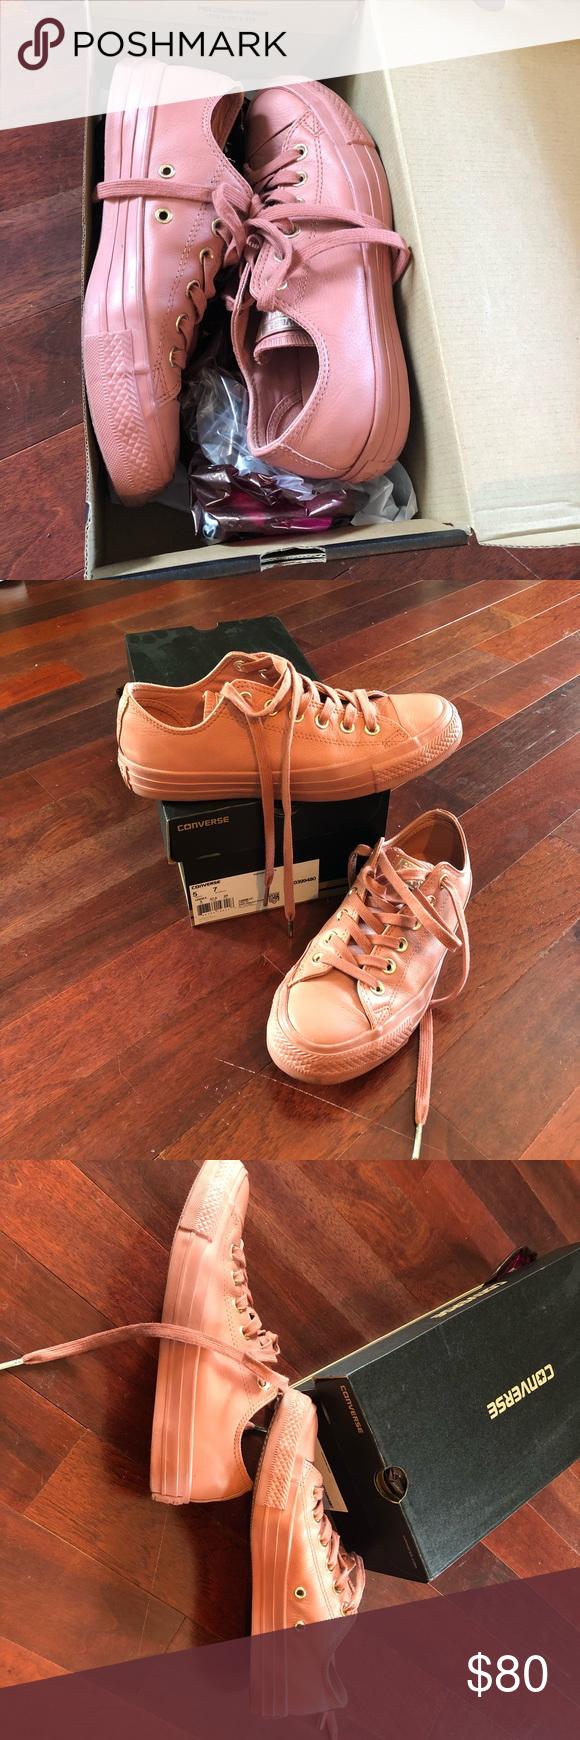 cb9816beaca7 Low Leather Desert Sand Pink Converse (Size 7) Converse Chuck Taylor All  Star Blush